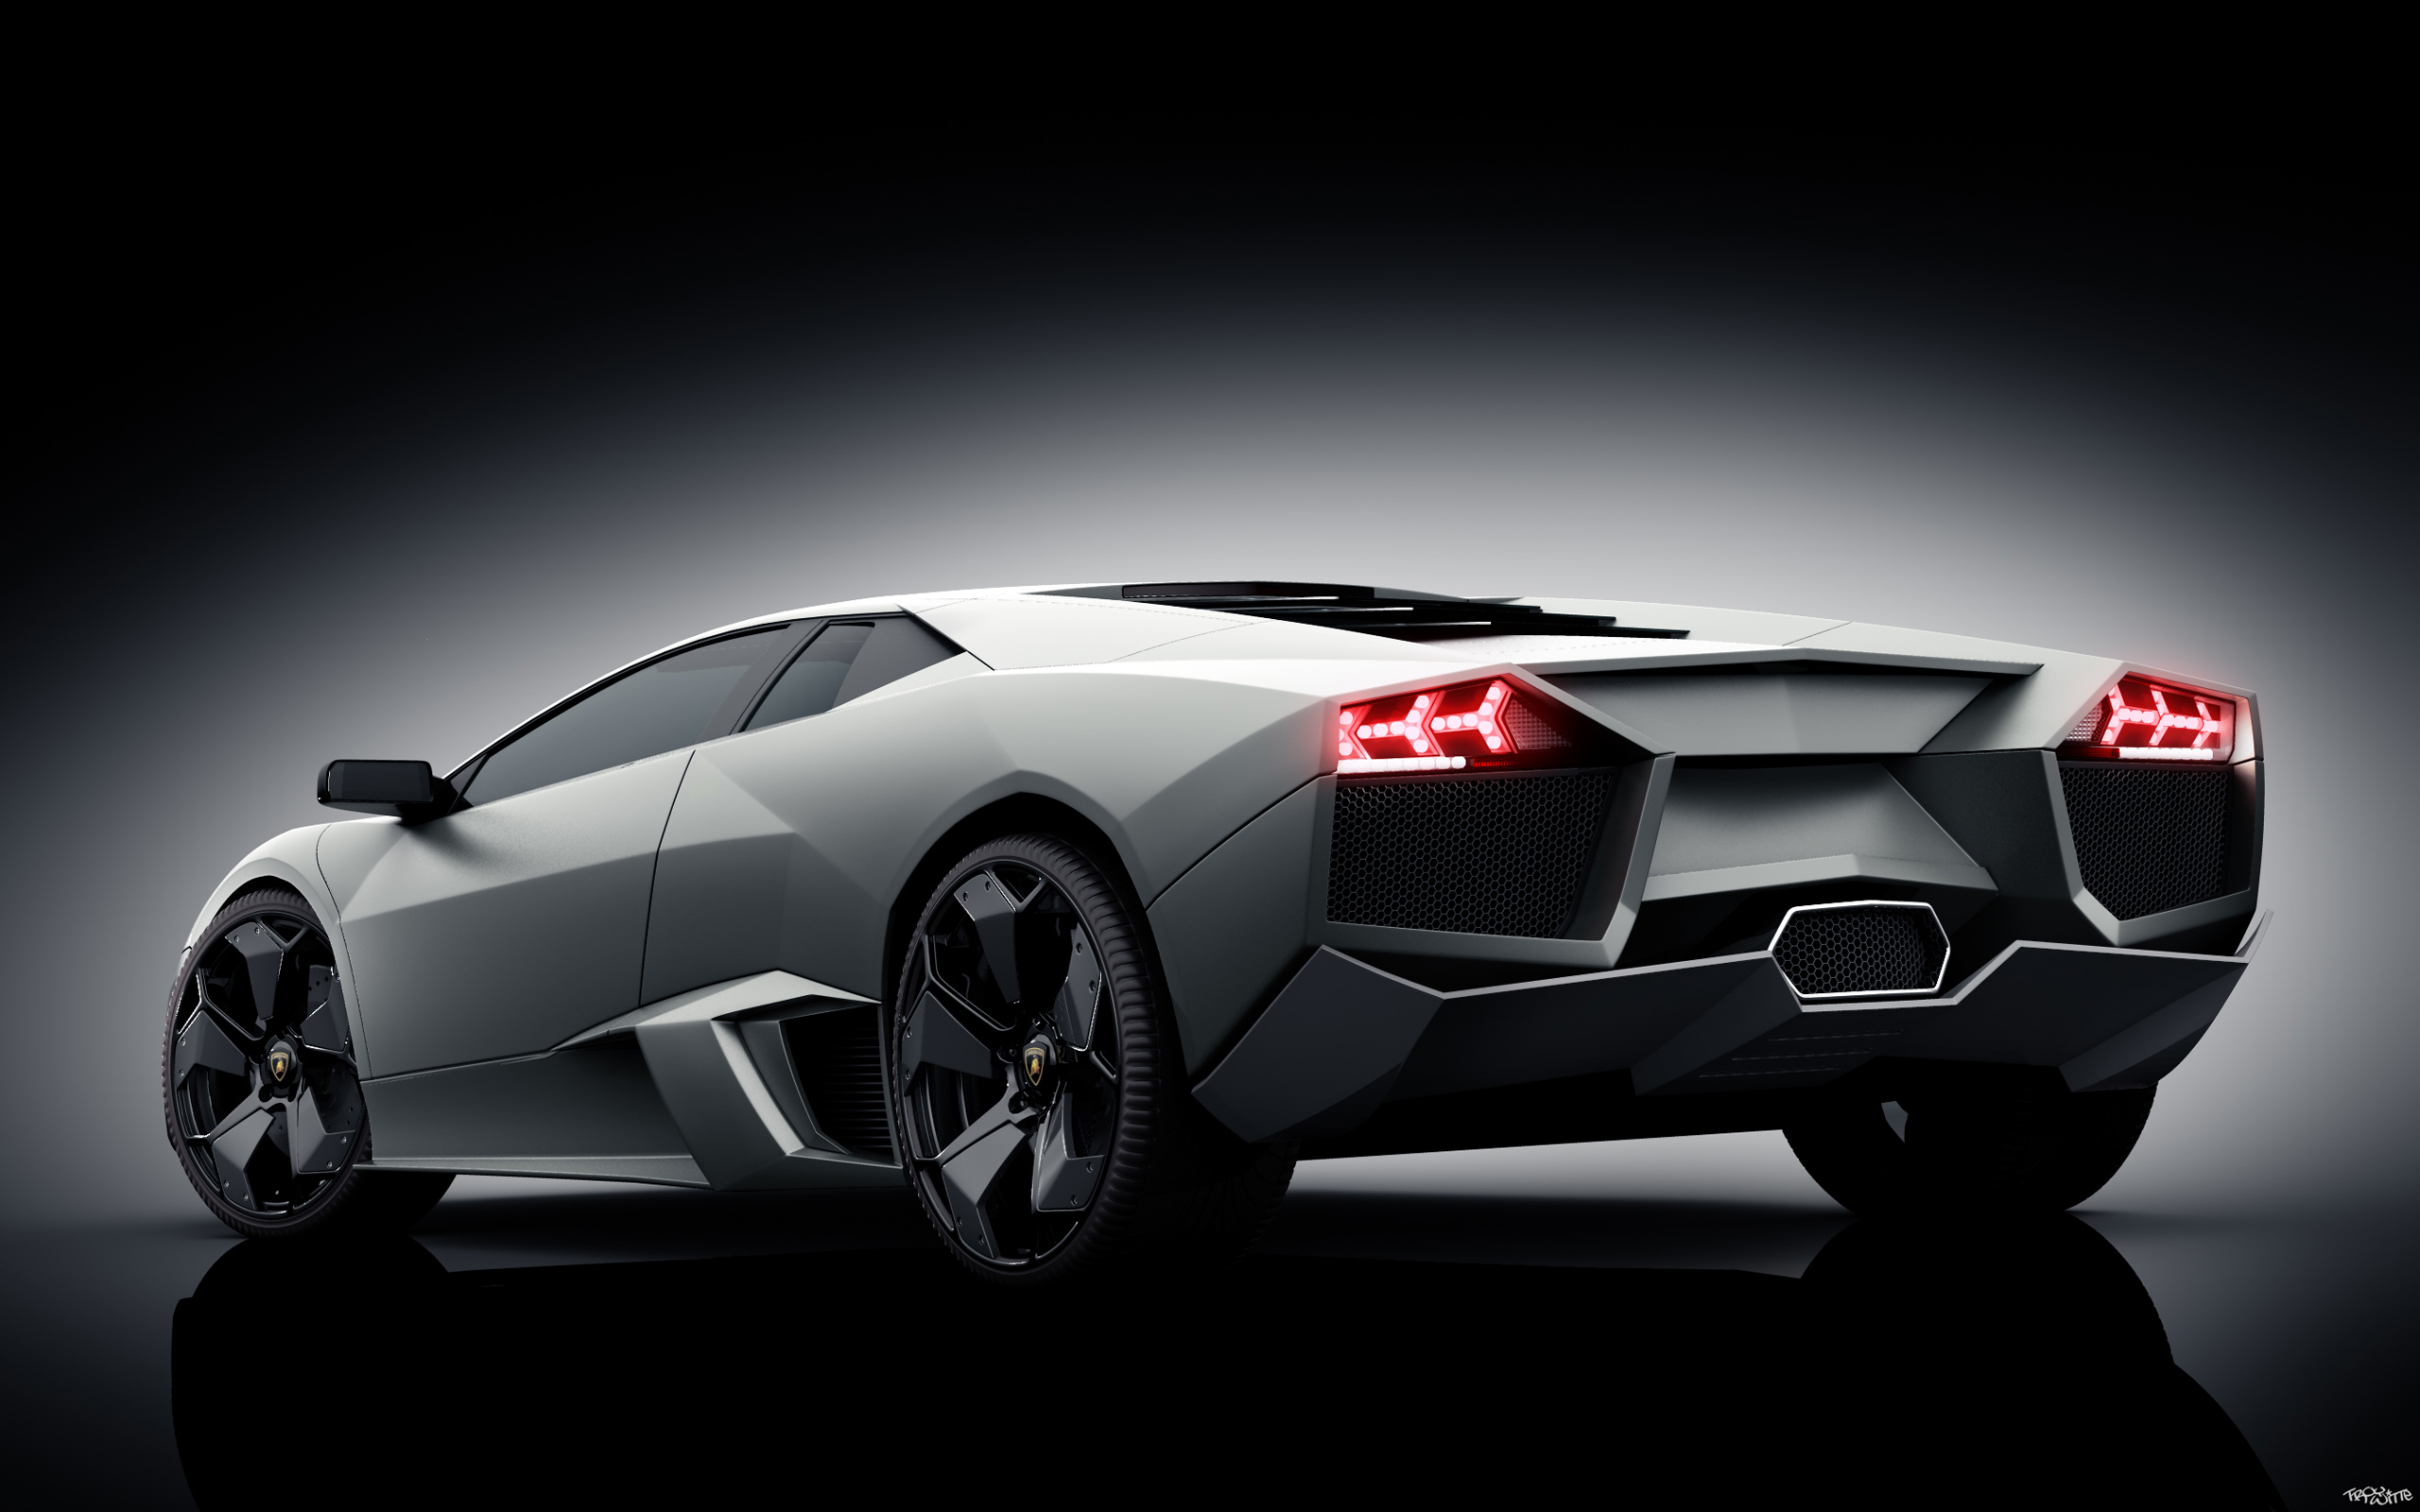 The Lamborghini Reventon Concept 2 Wallpaper Hd Car Wallpapers